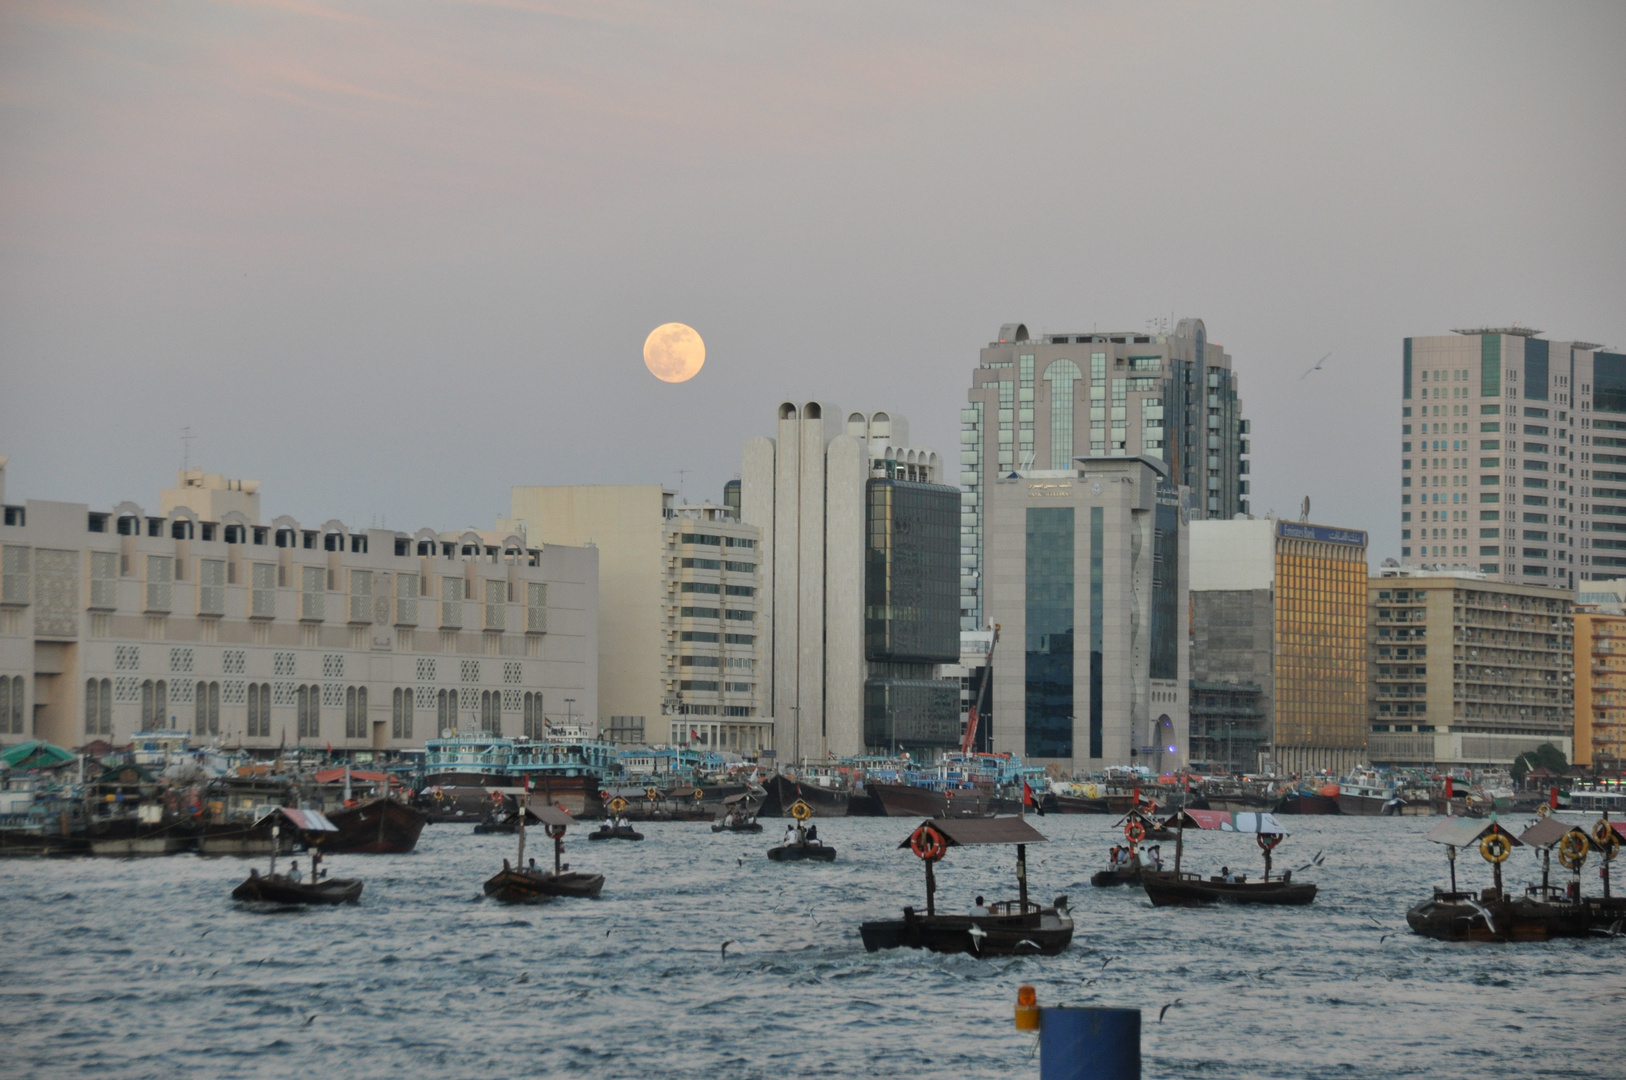 Dubai - Full moon